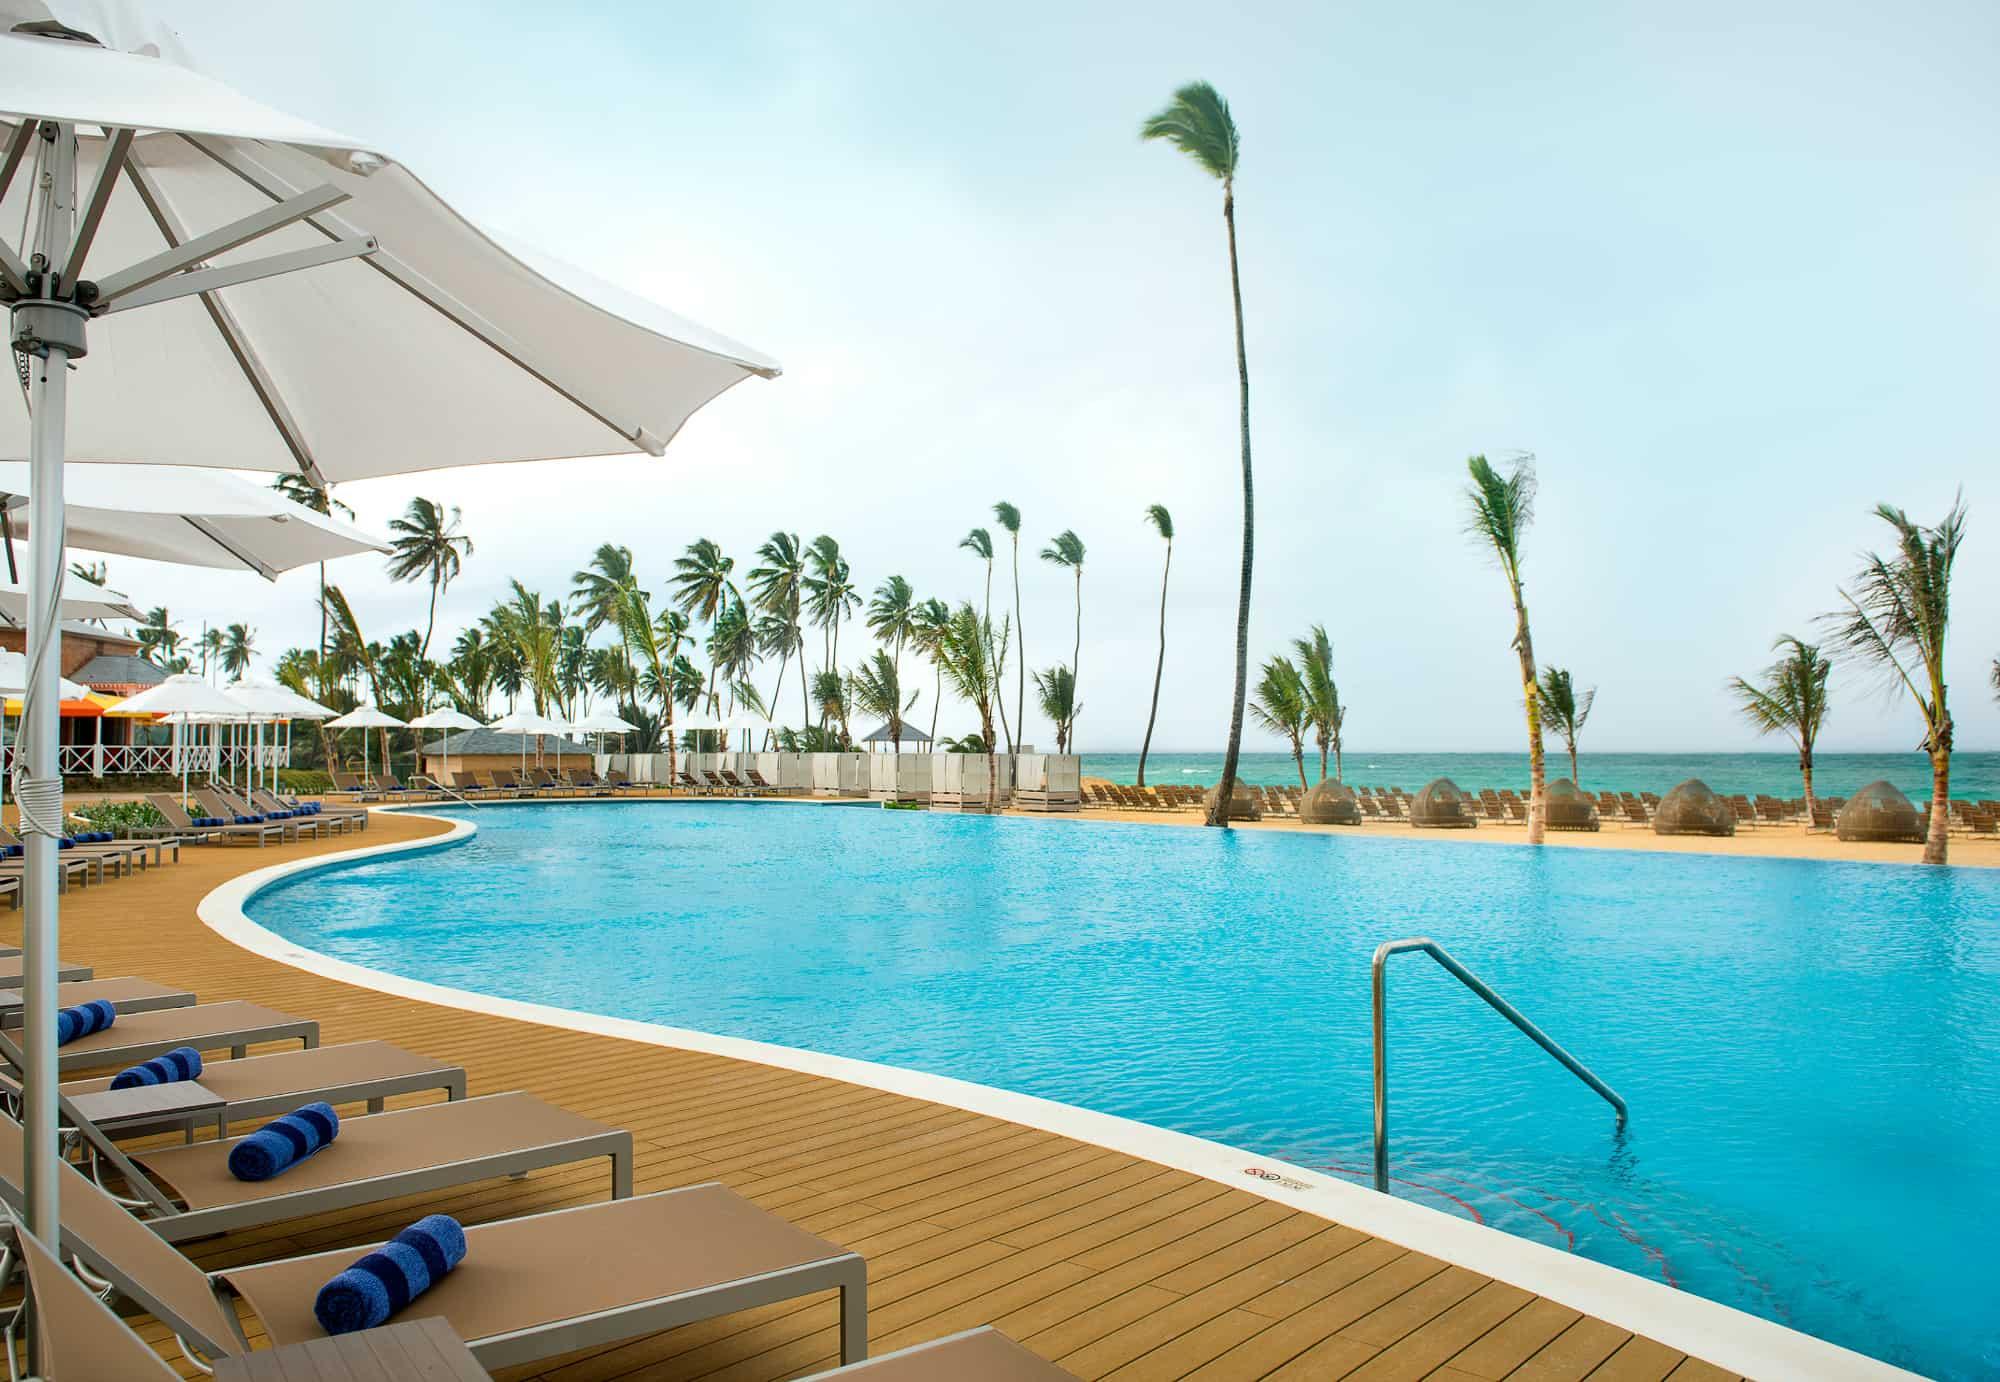 Nickelodeon Hotels & Resorts Punta Cana pool